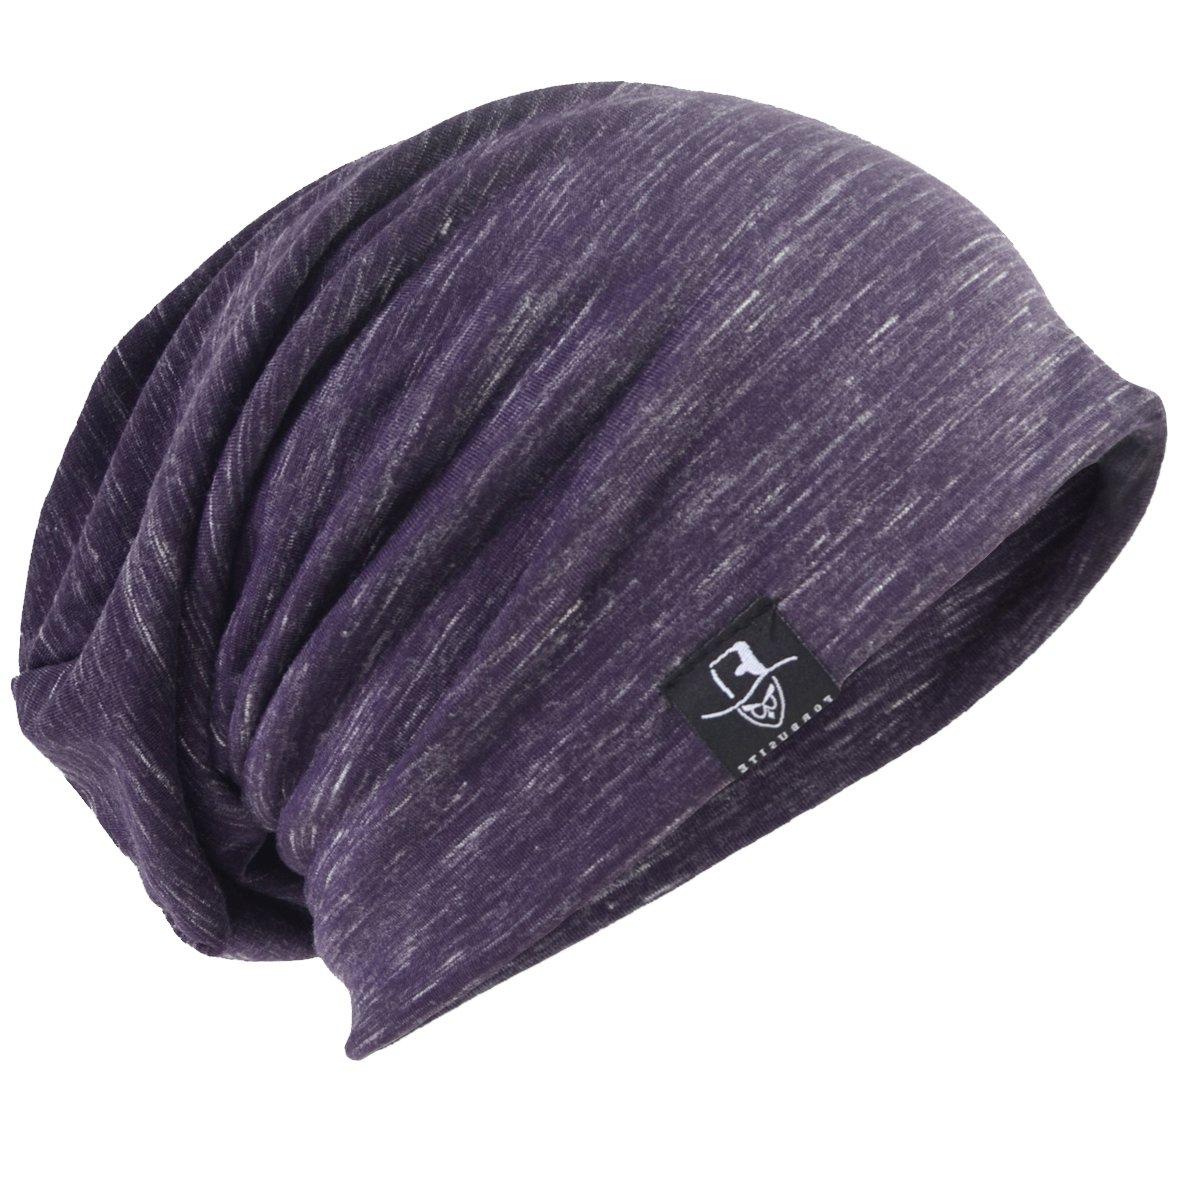 HISSHE Retro Slouchy Beanie Jersey Skull Cap Slouch Baggy Summer Hat B083